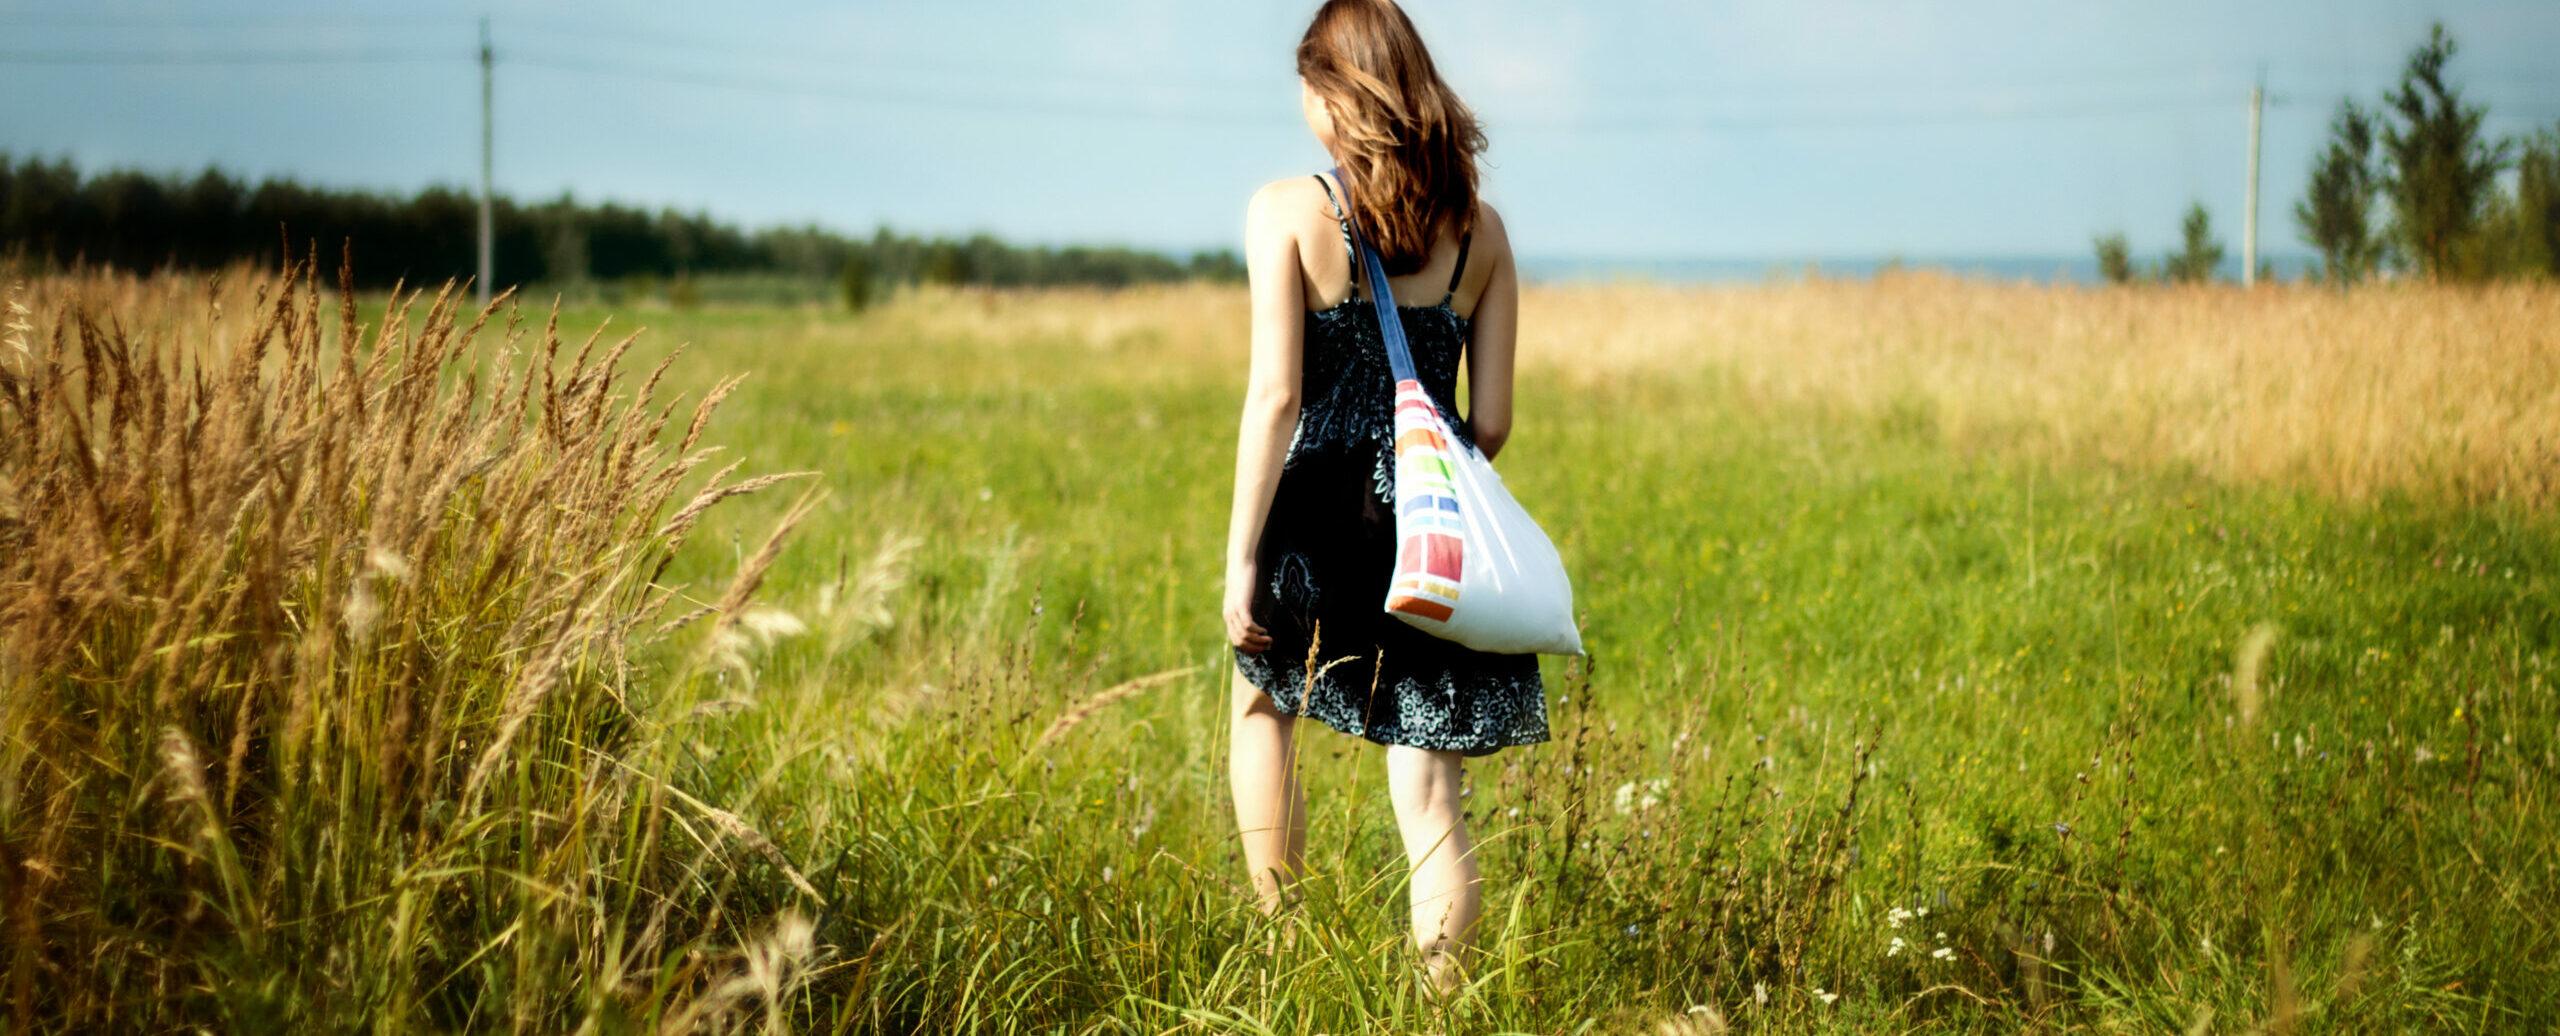 Frau im Sommergewand geht im Herbstfeld